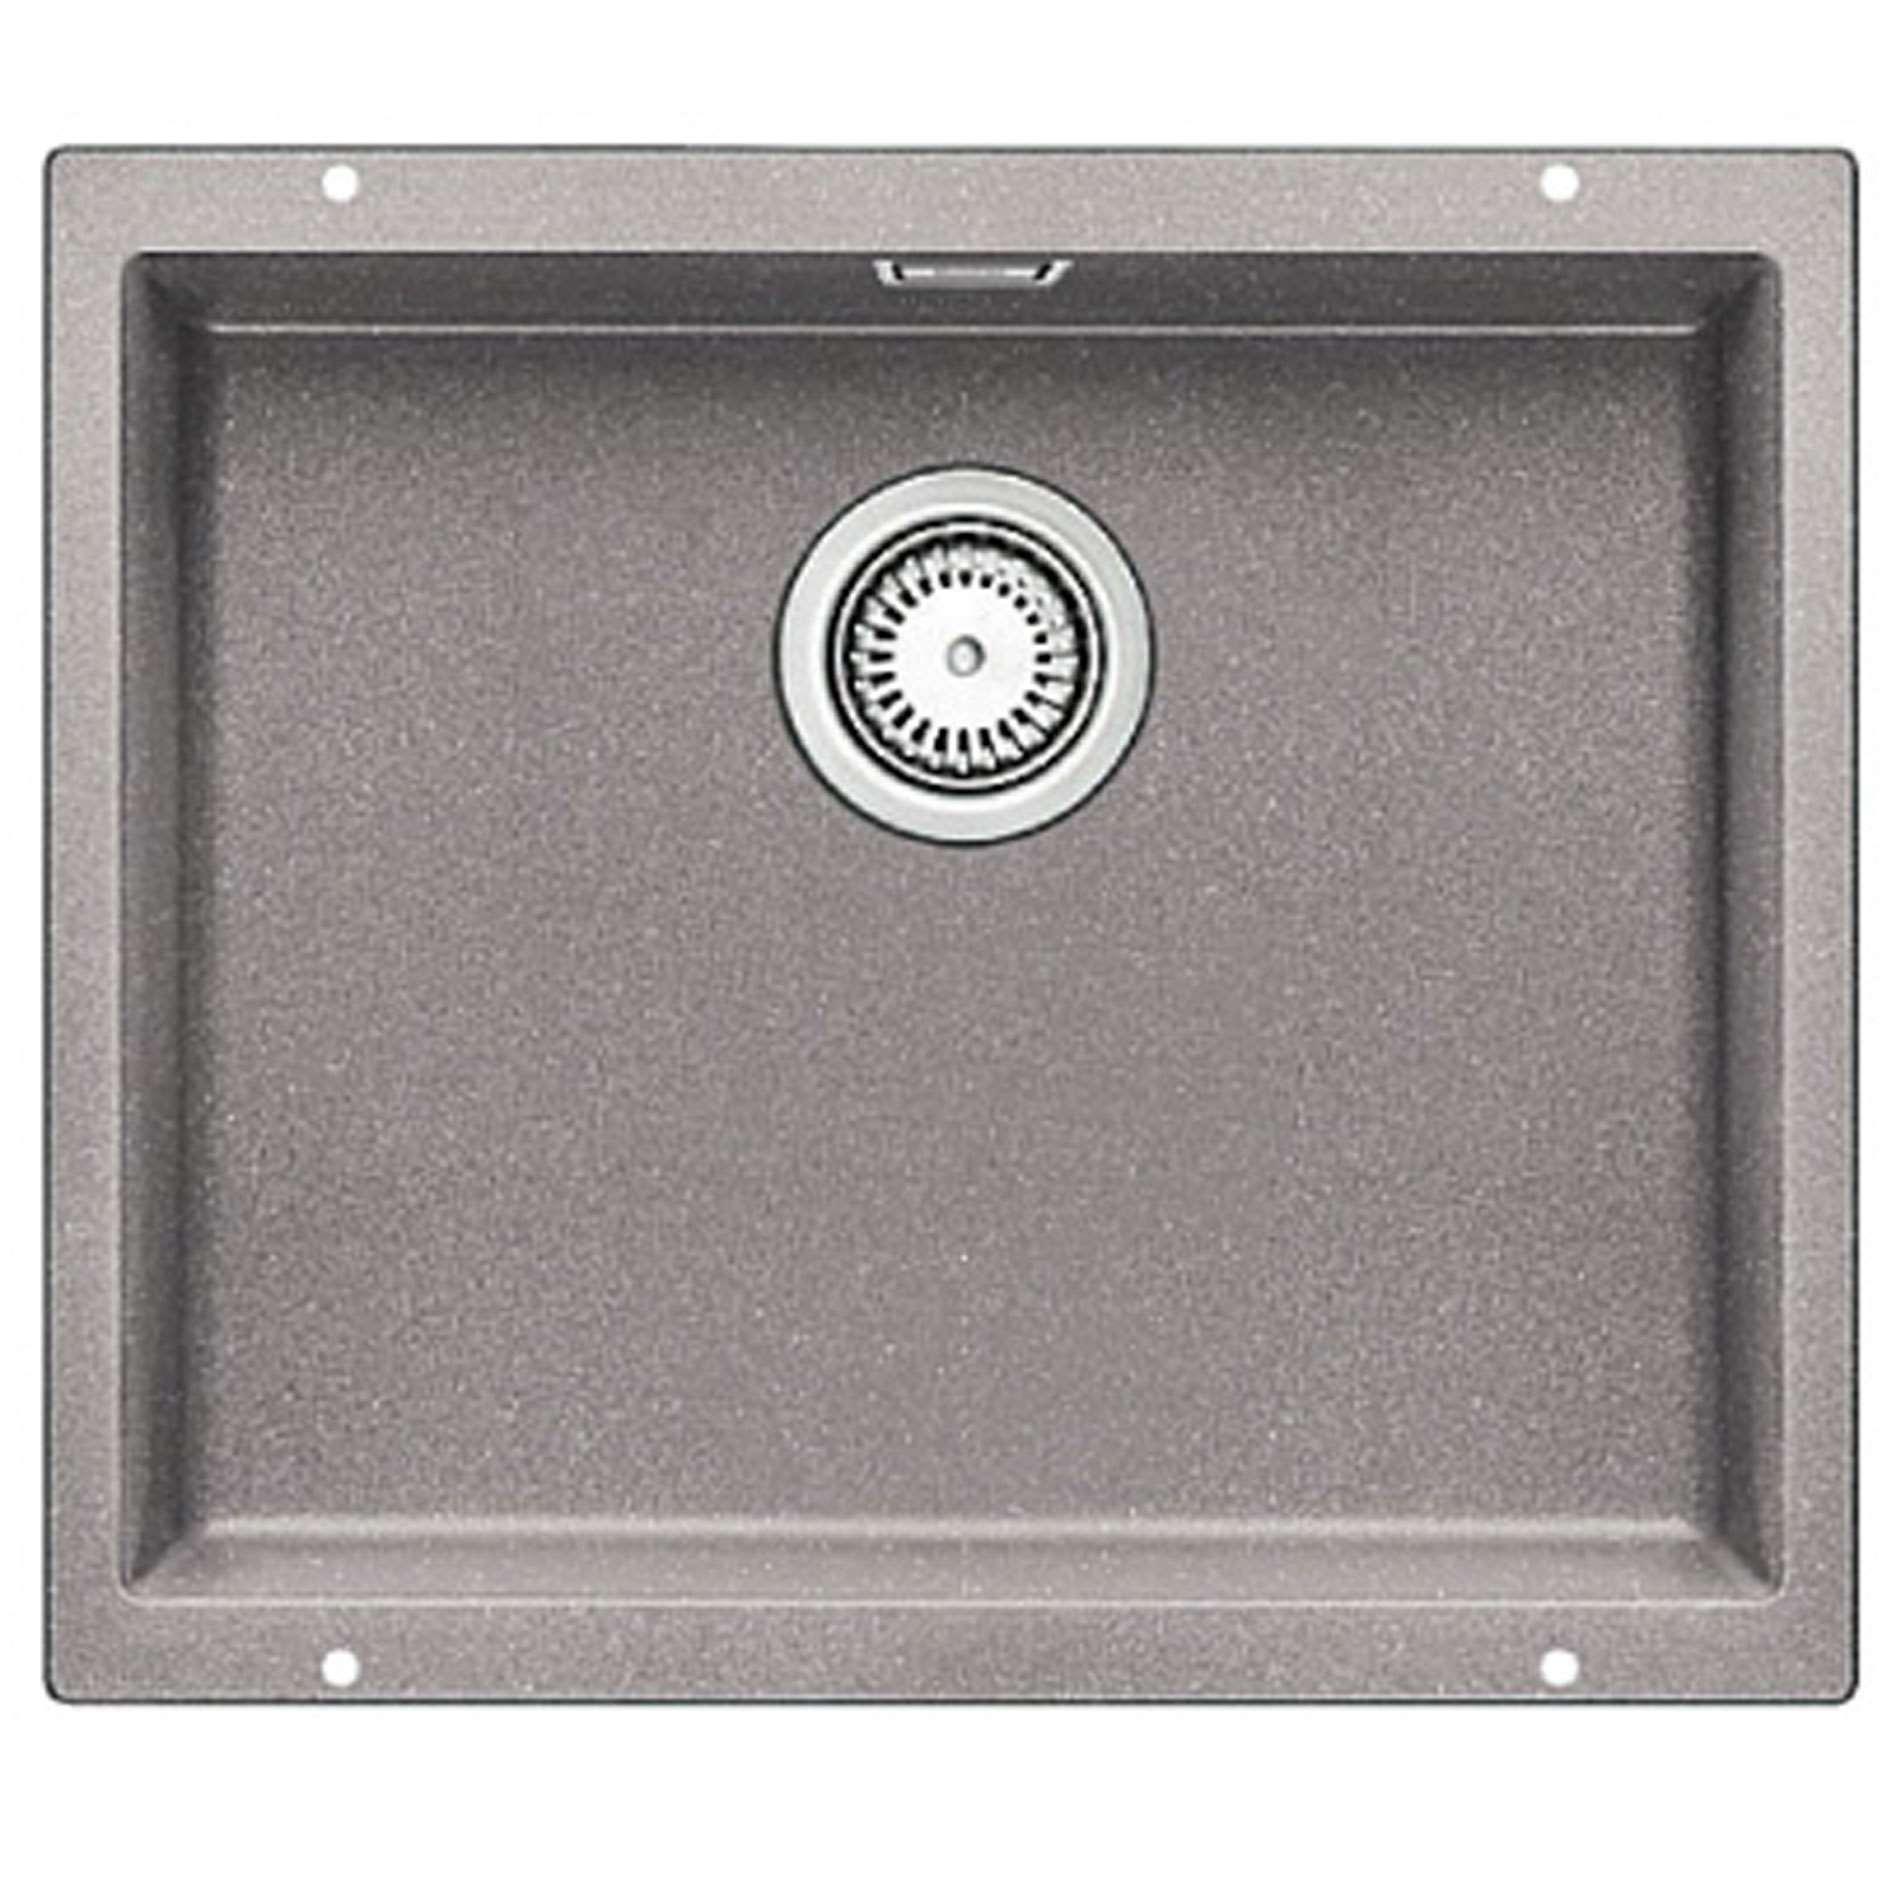 blanco subline 500 u alumetallic silgranit sink kitchen sinks taps. Black Bedroom Furniture Sets. Home Design Ideas